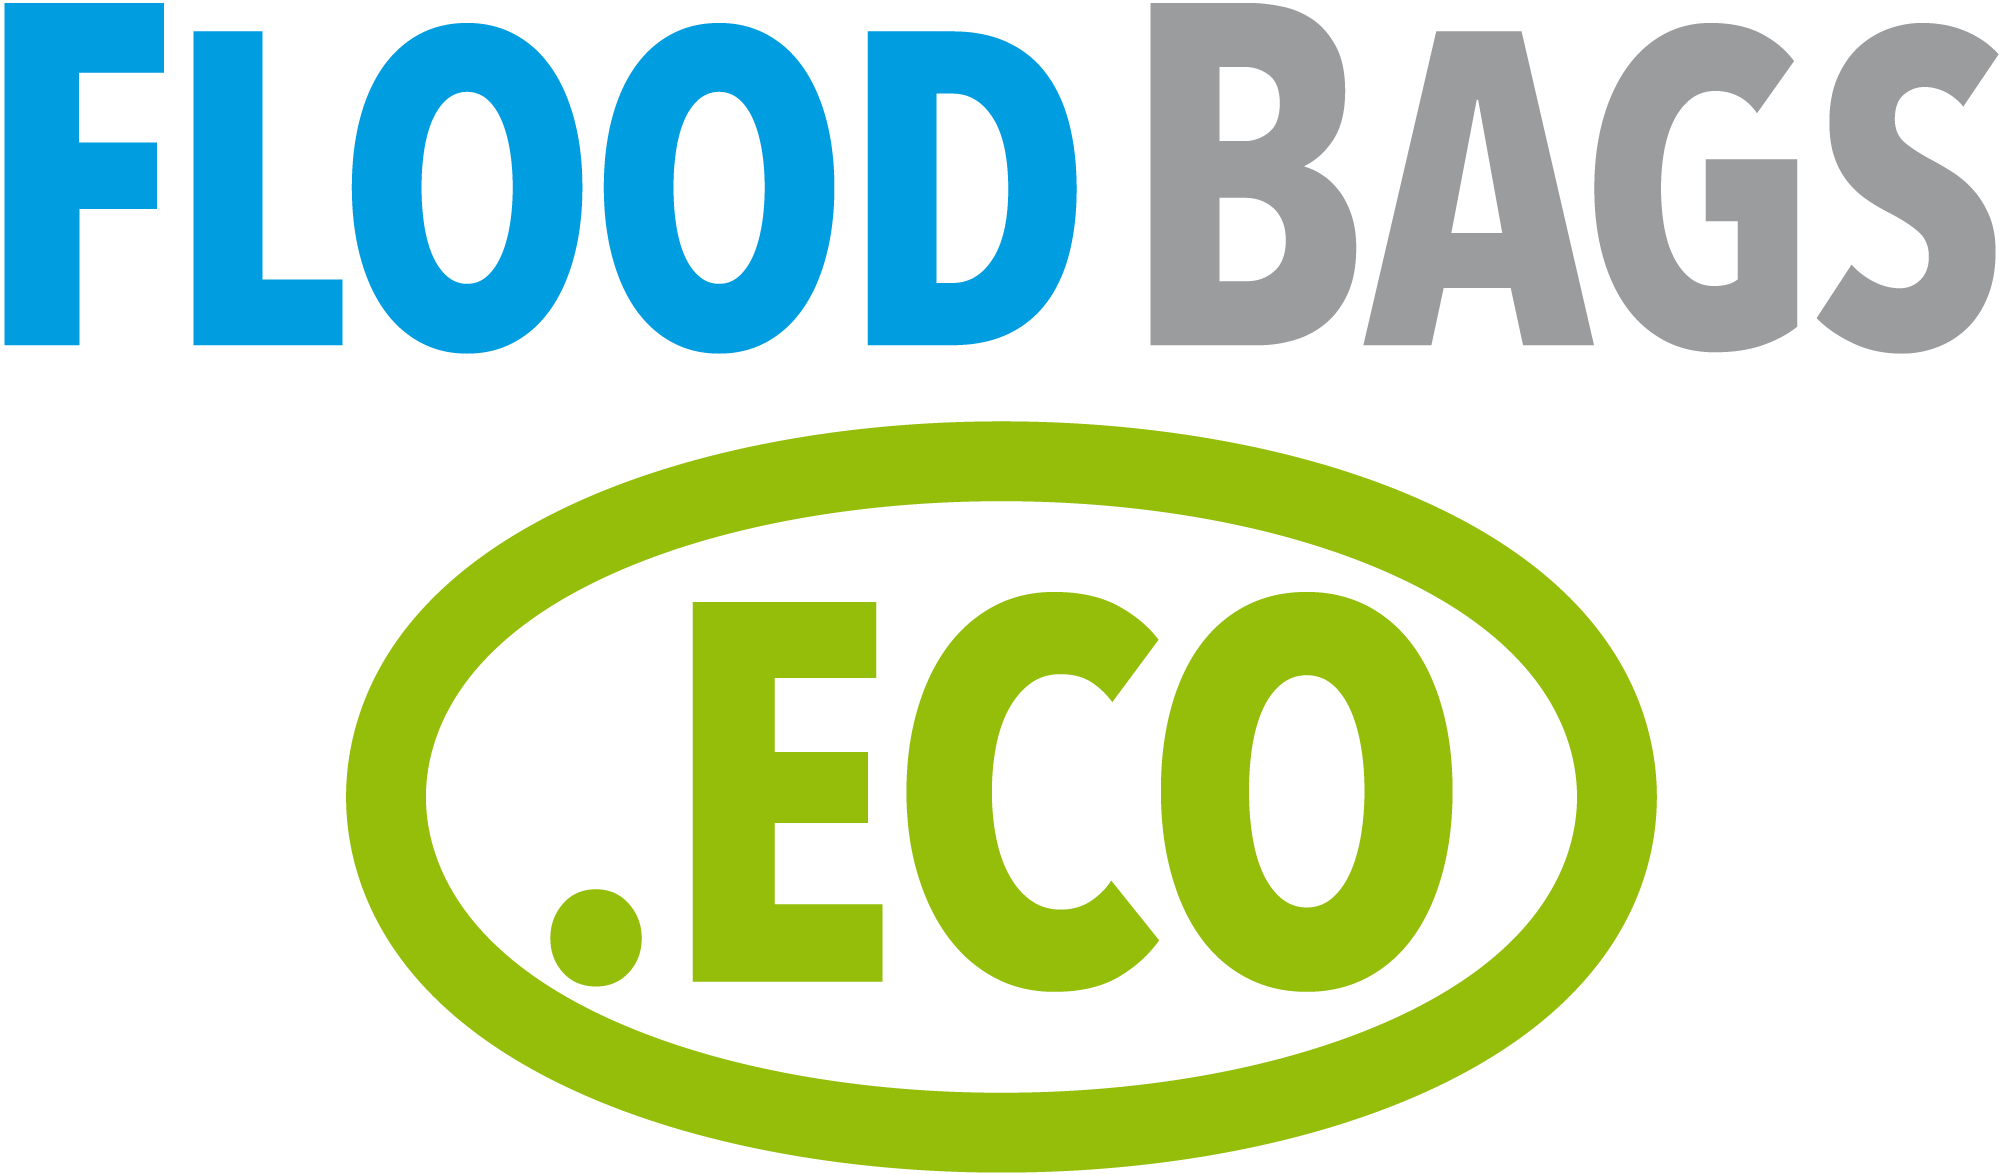 FloodBags.eco